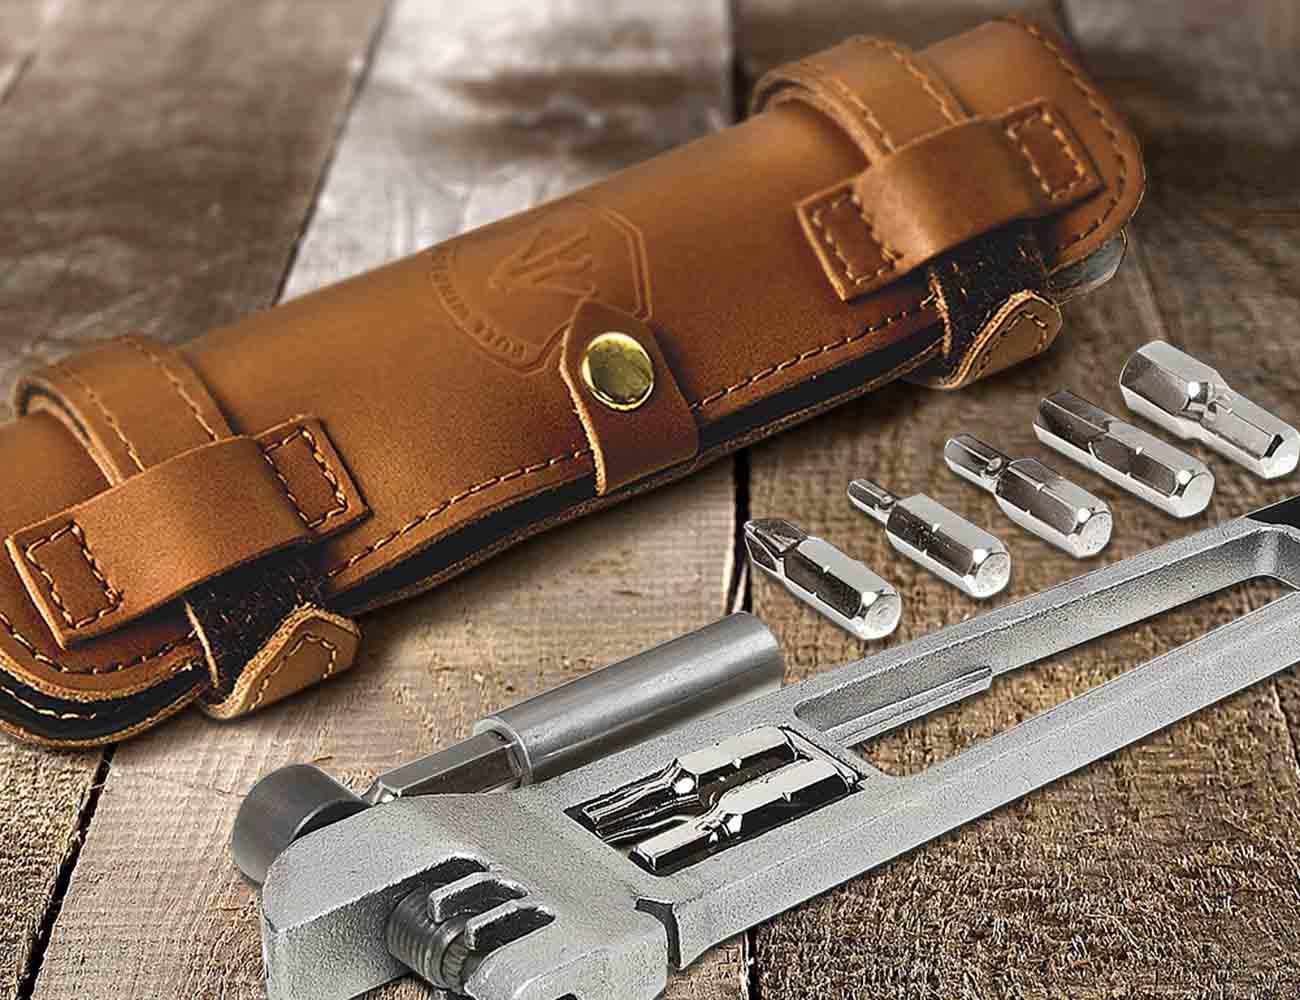 The Breaker Cycle Multi Tool by Full Windsor